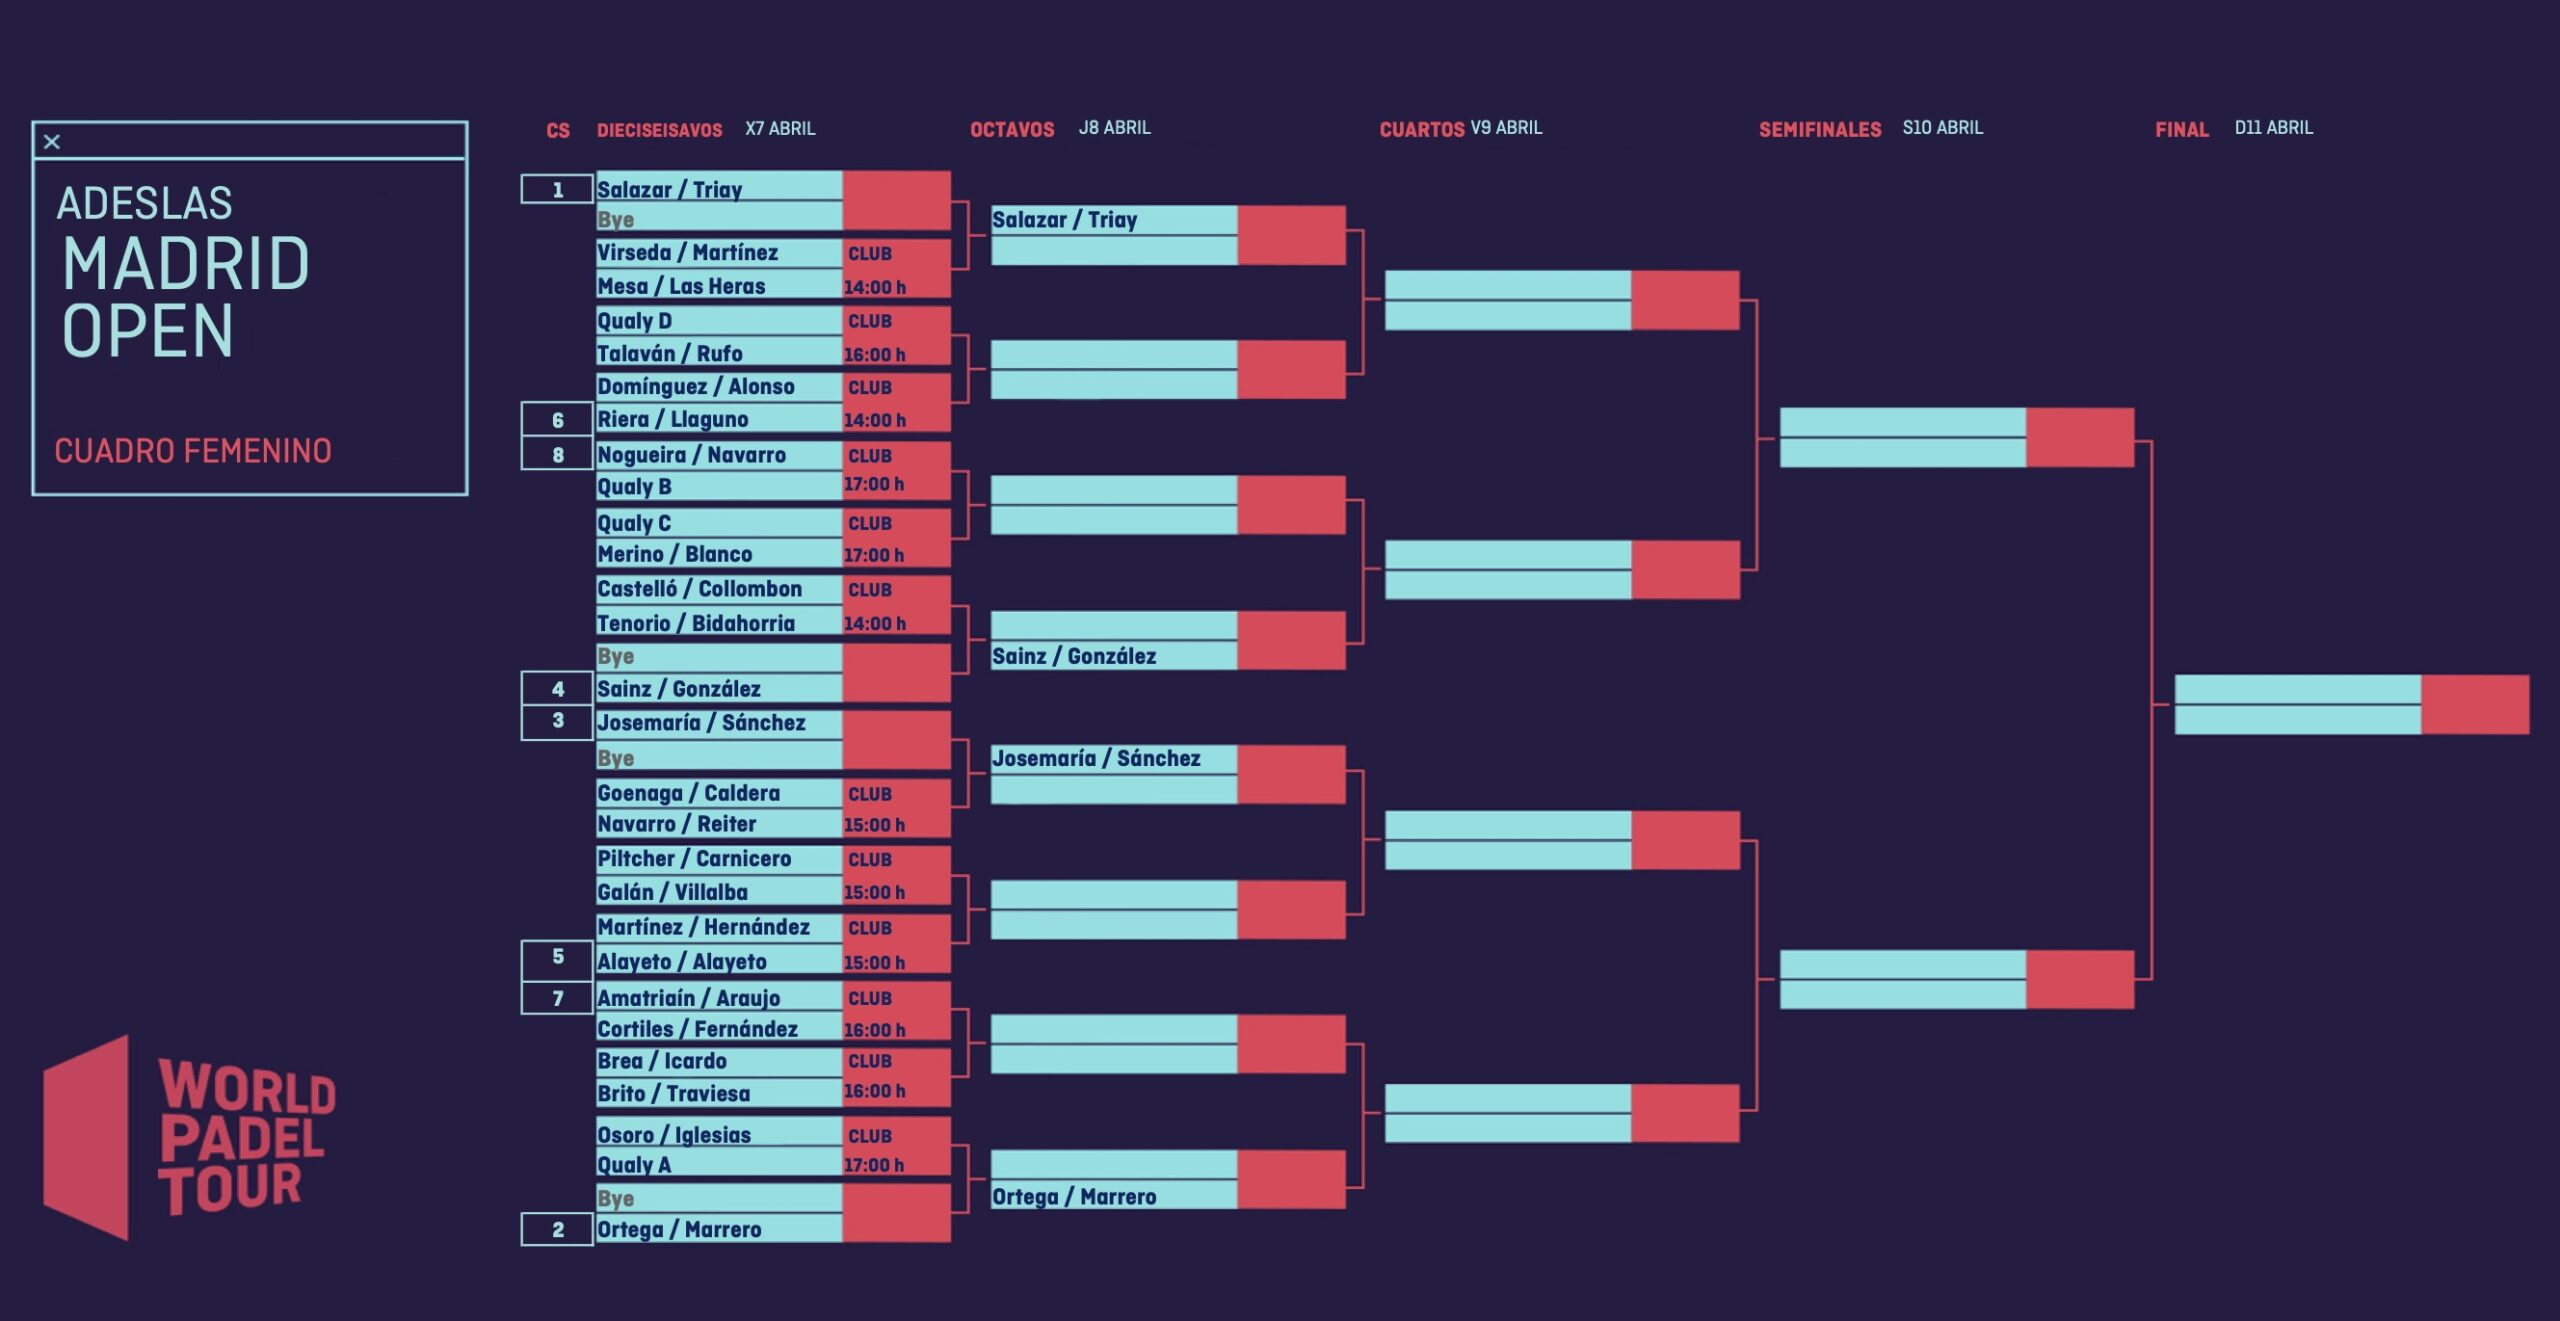 Cuadro femenino primer torneo temporada 2021